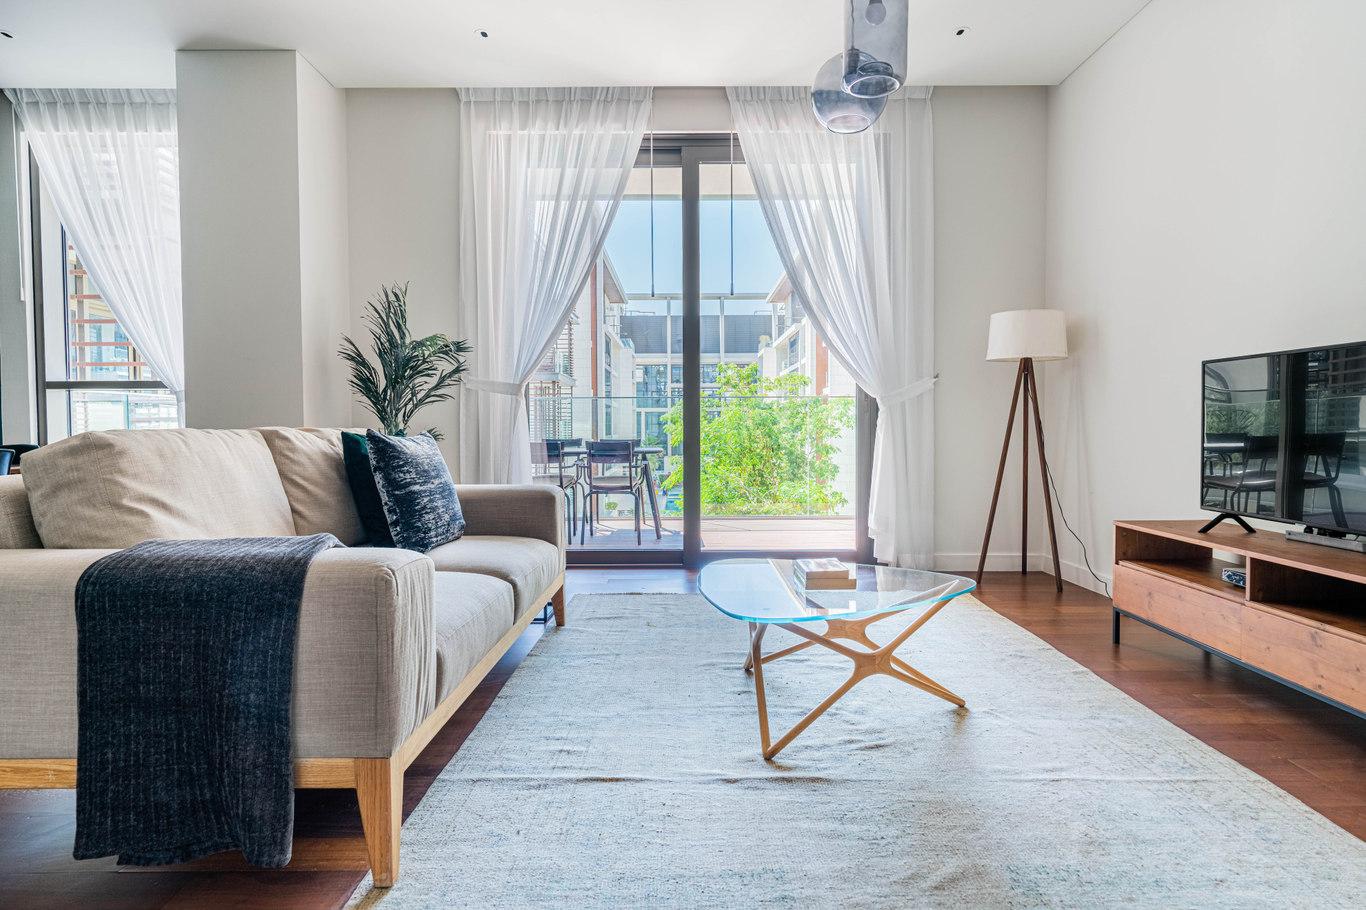 2 bedroom furnished apartment in Princess Apartment VVI 809, Princess Tower, Dubai, photo 1